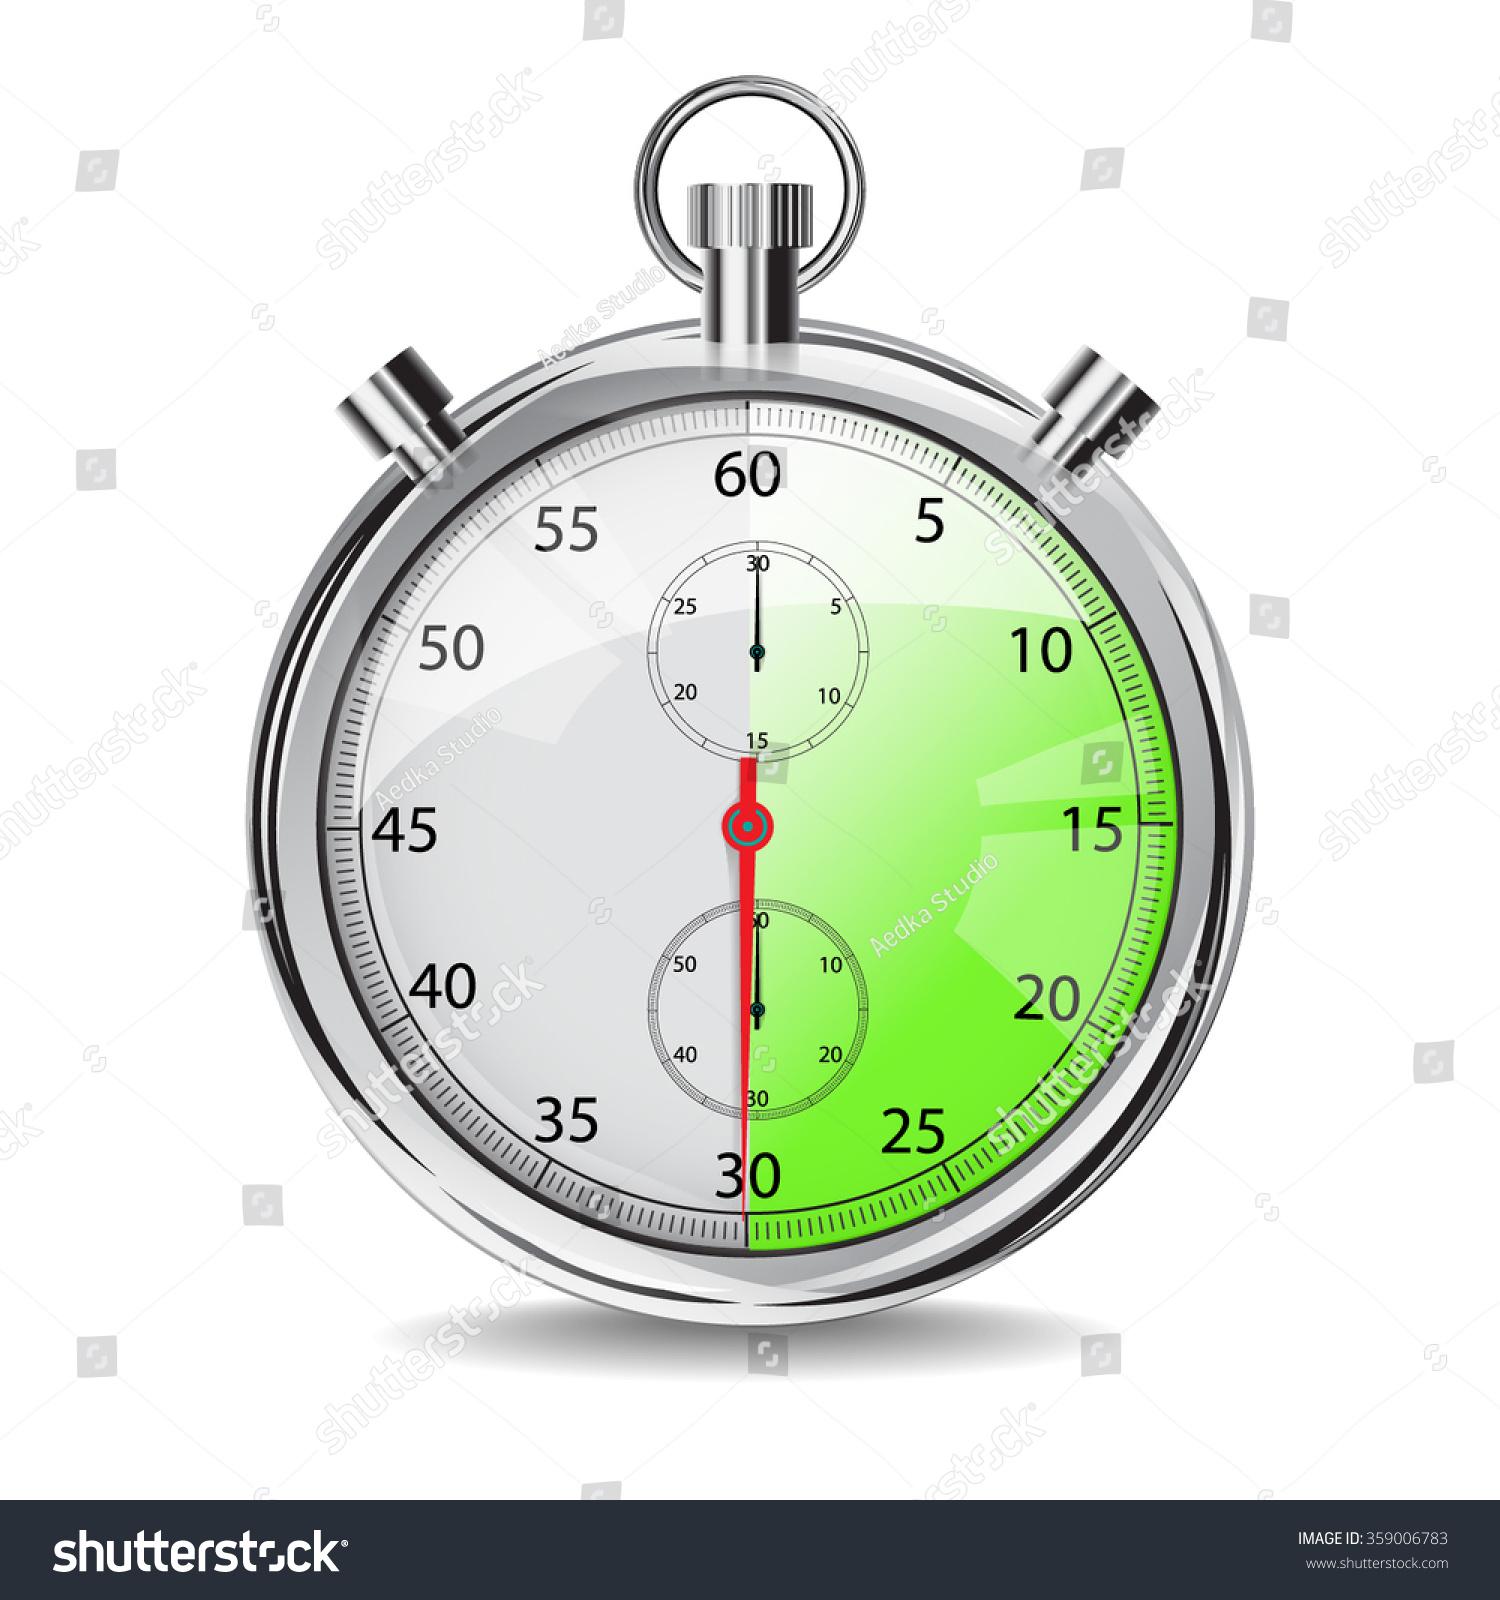 30 Seconds Stop Watch Mechanical Stopwatch Stock Vector 359006783 ...